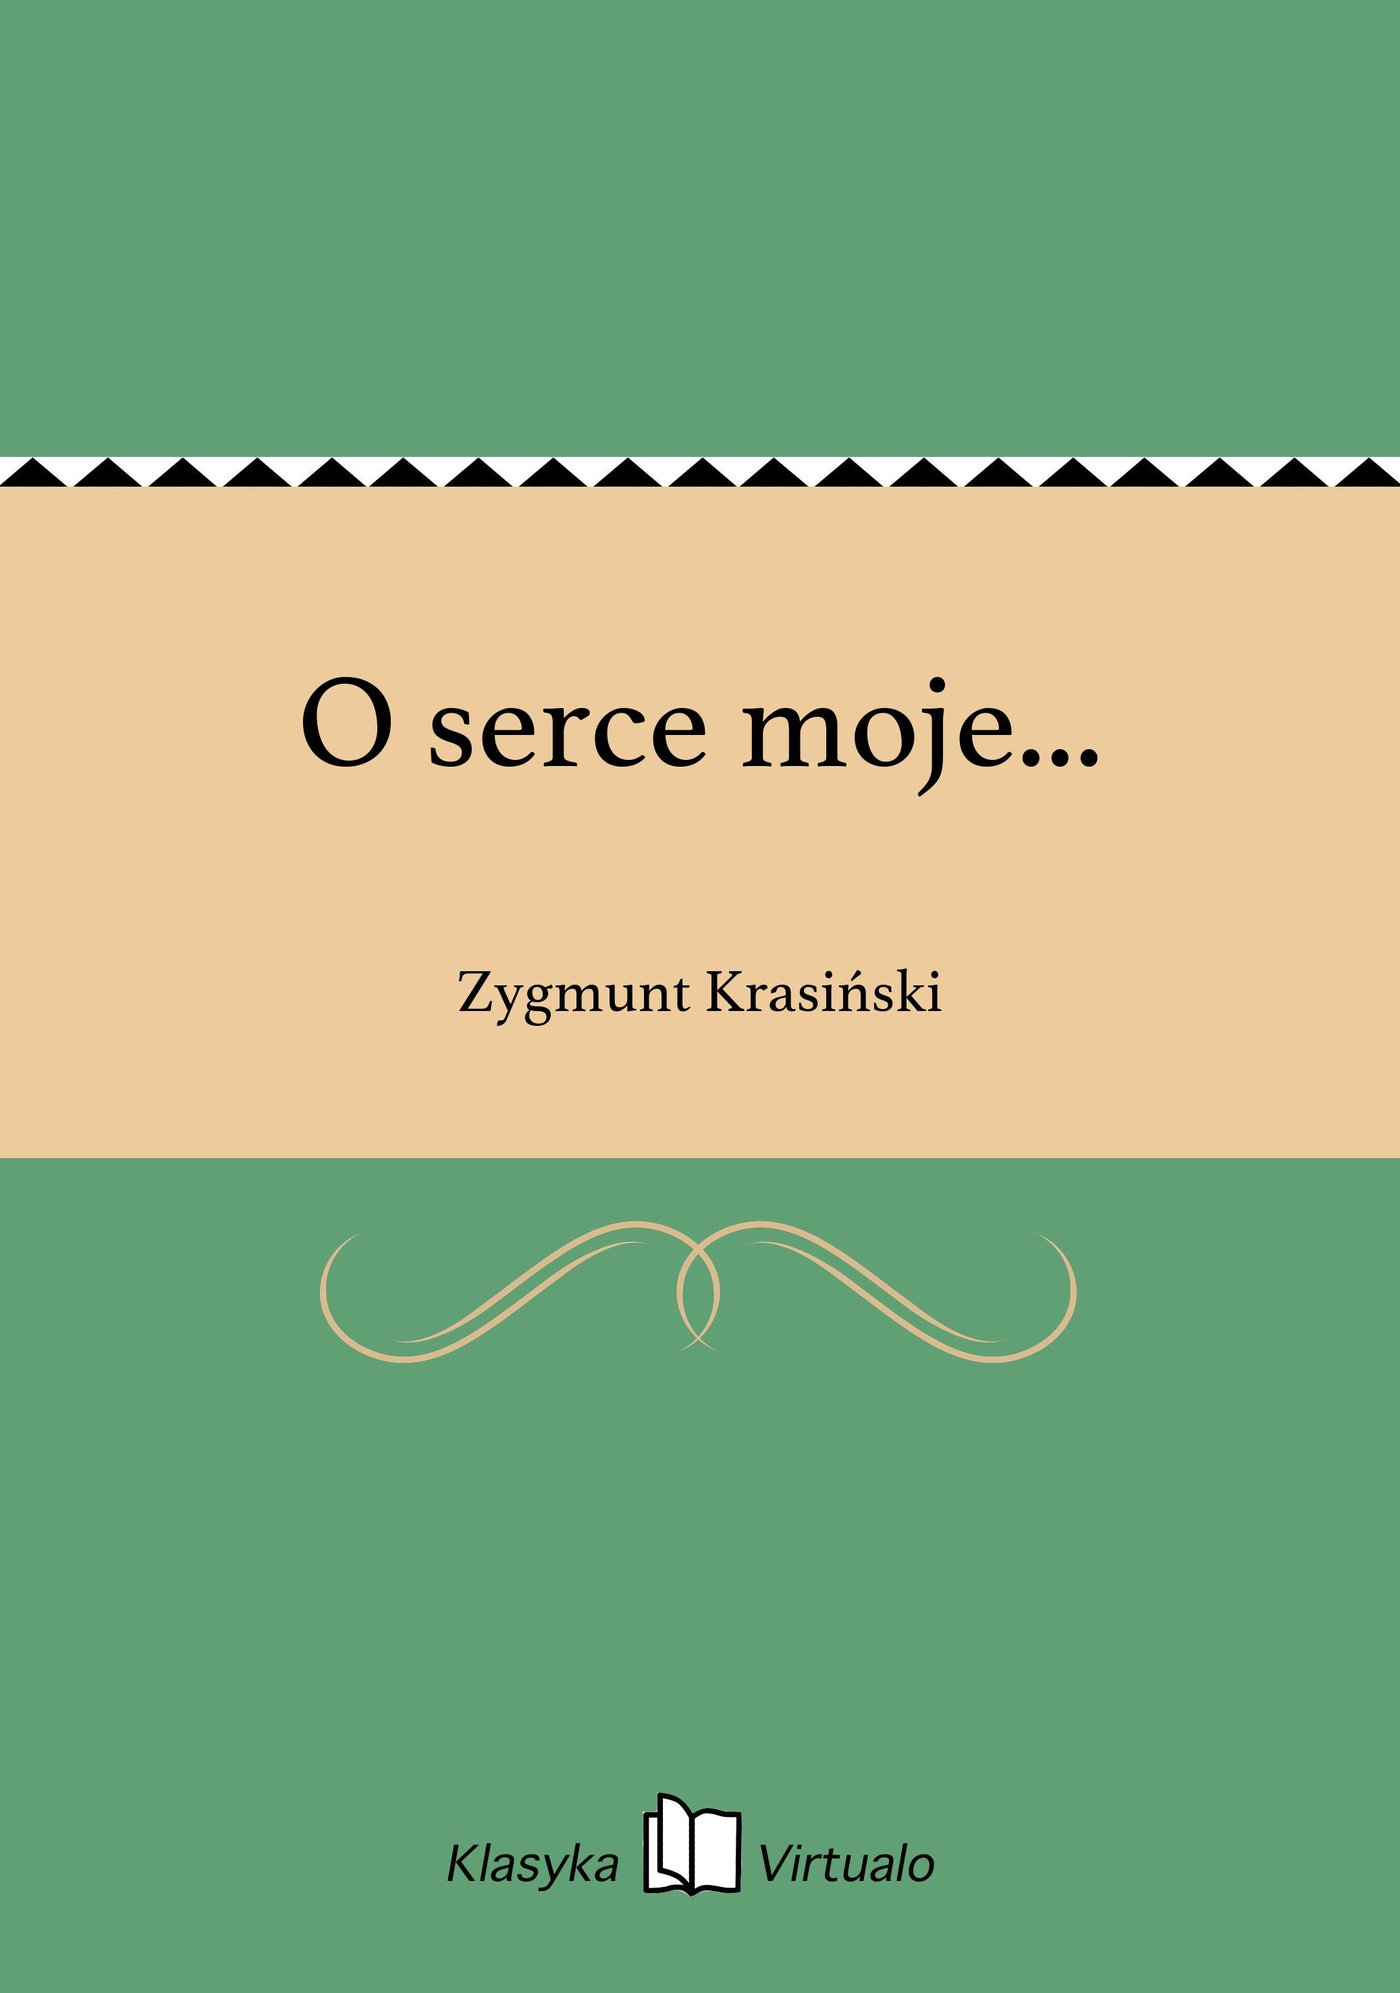 O serce moje... - Ebook (Książka na Kindle) do pobrania w formacie MOBI